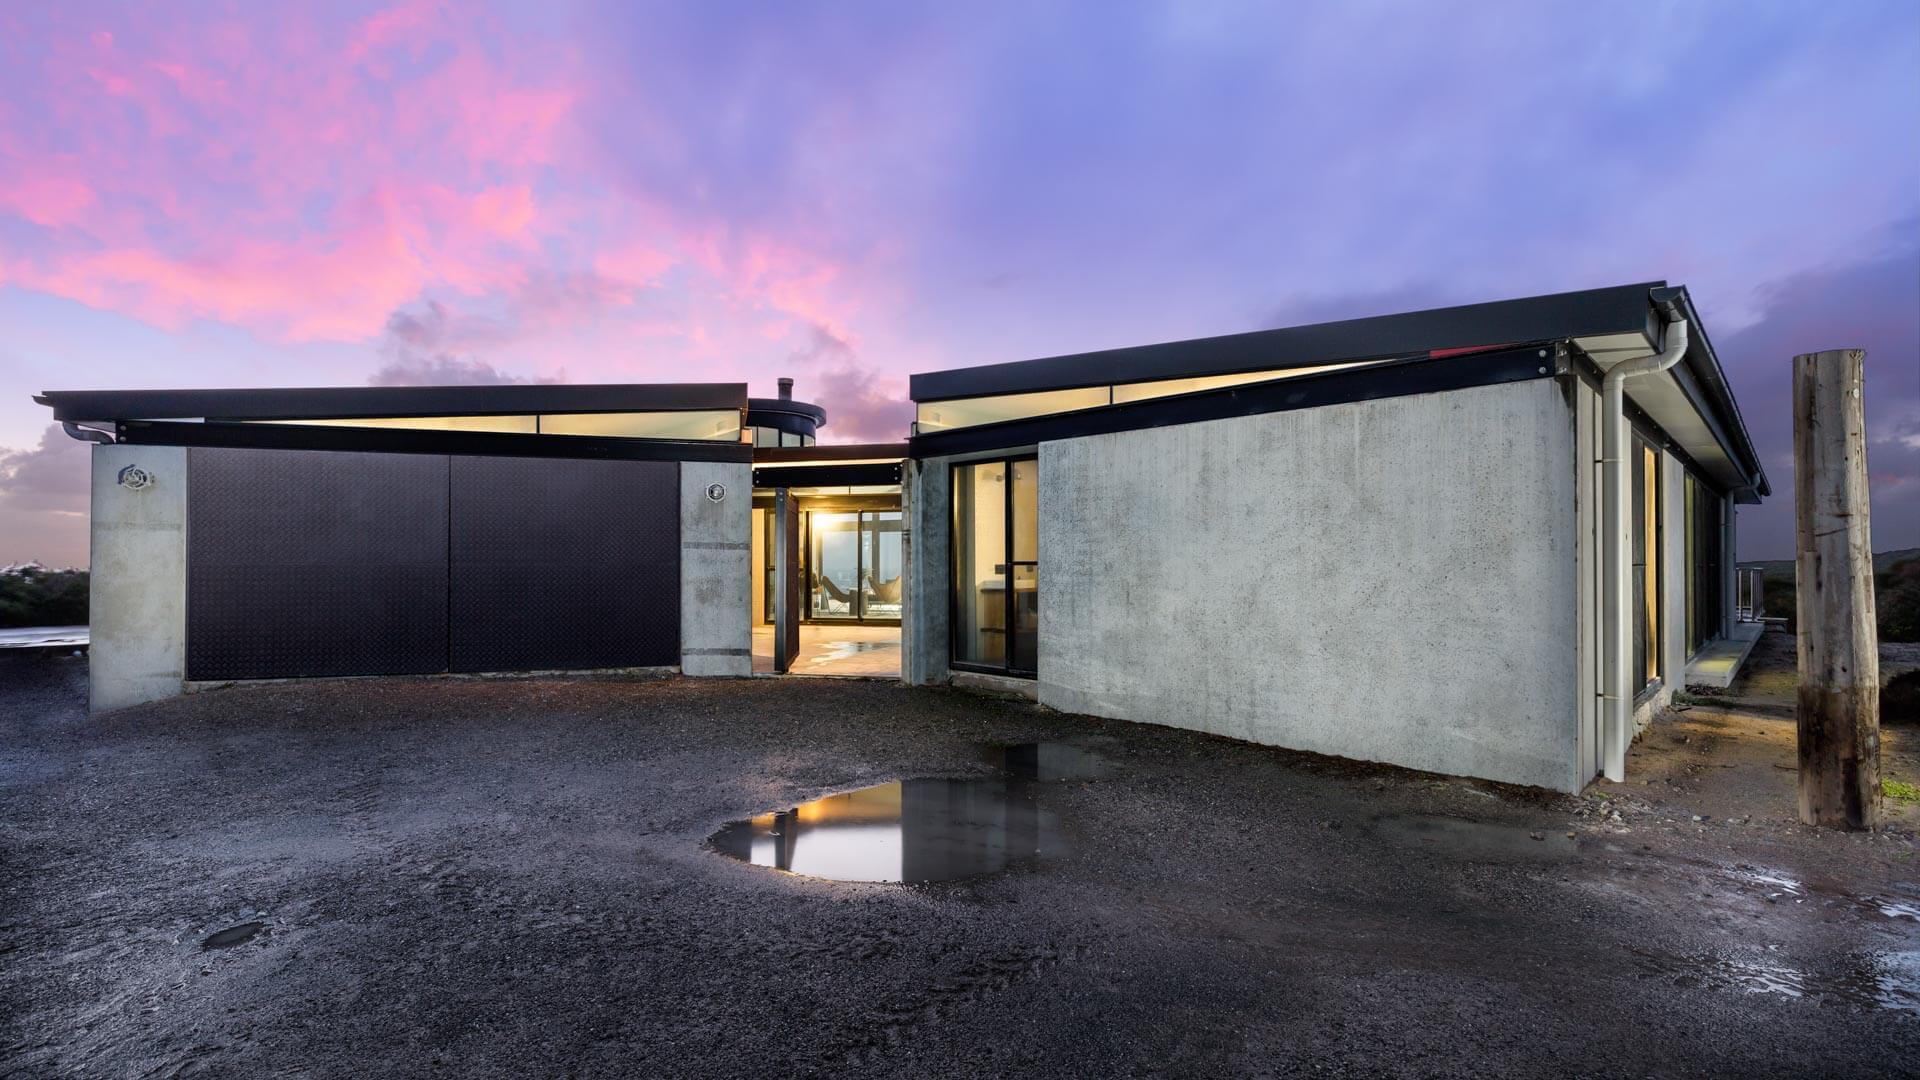 rtp-architectural-photography-cape-liptrap-off-the-grid-house